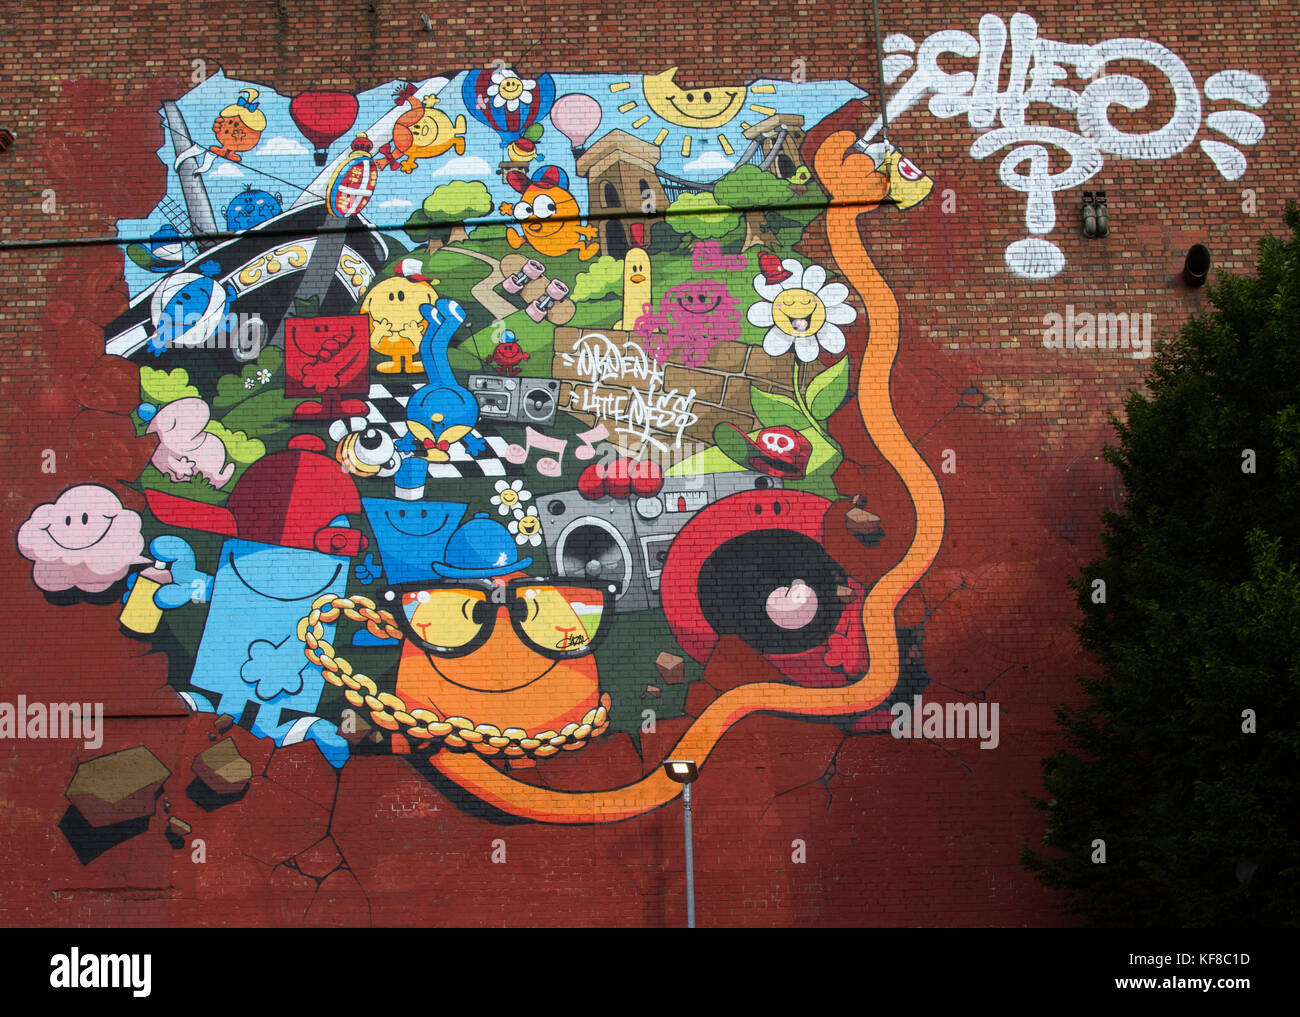 Sreet Art in Bristol at Upfest 2016 - Stock Image